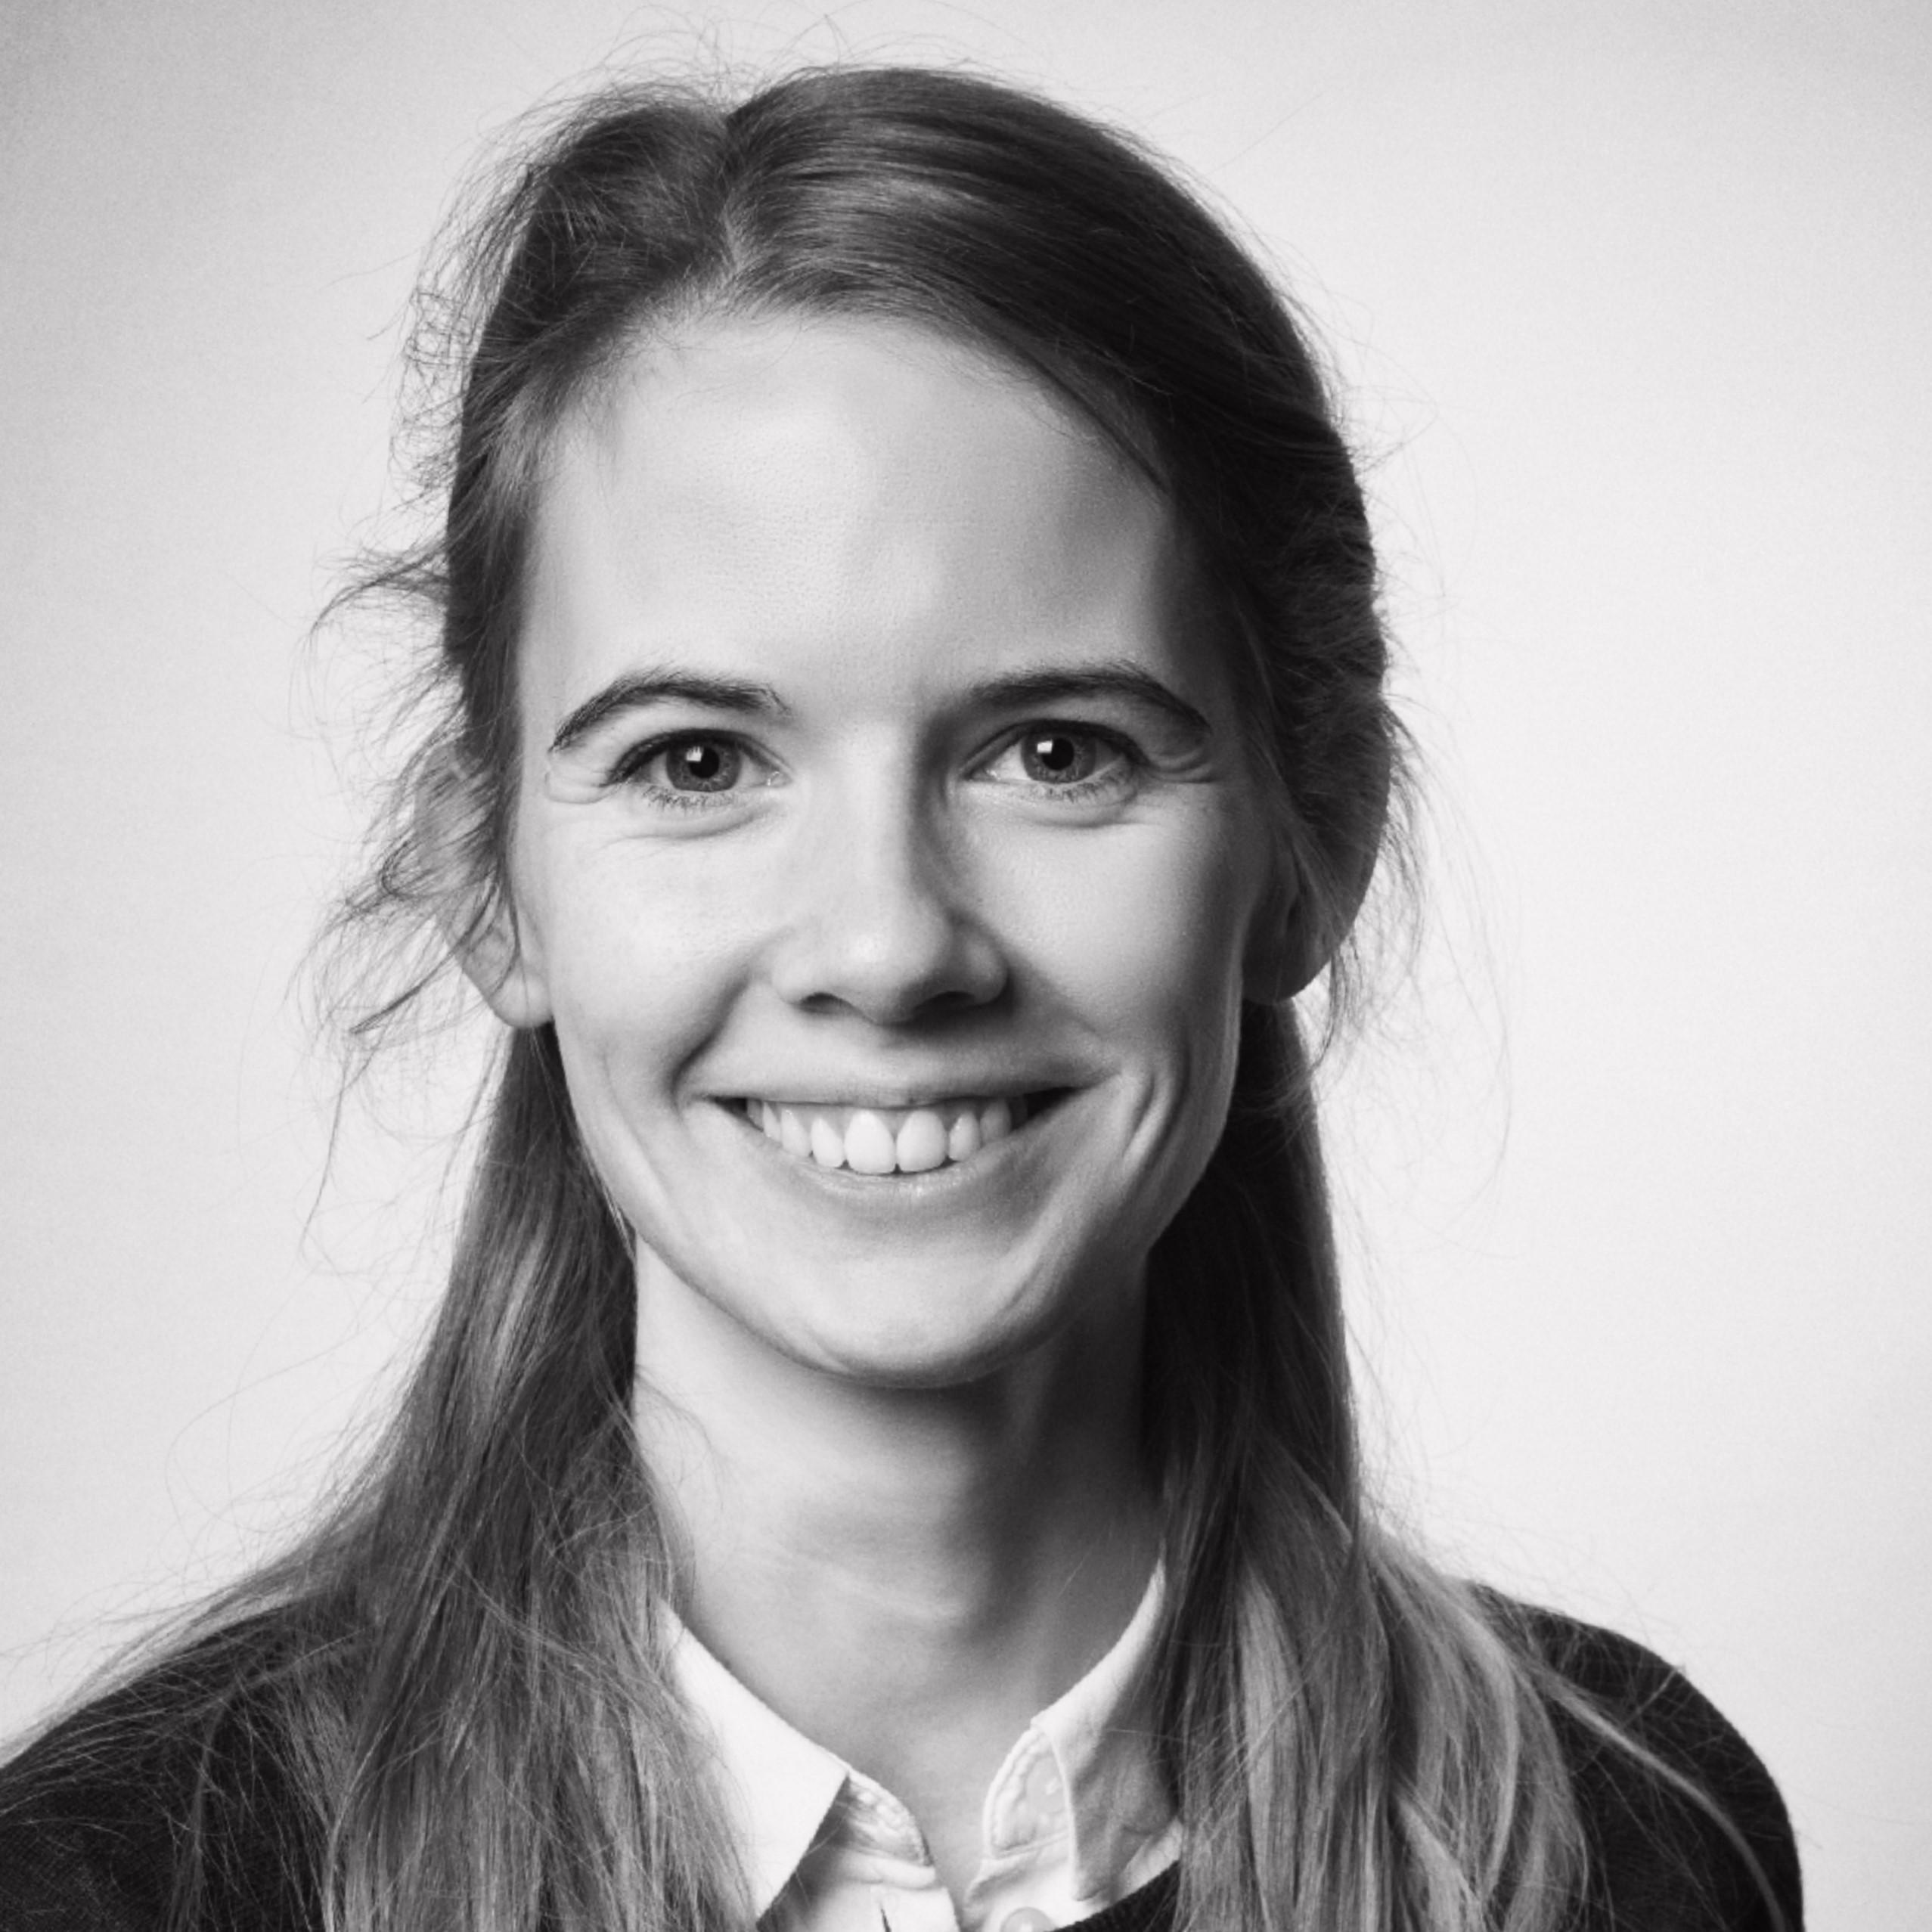 Cecilie Maria Schmidt Thøgersen